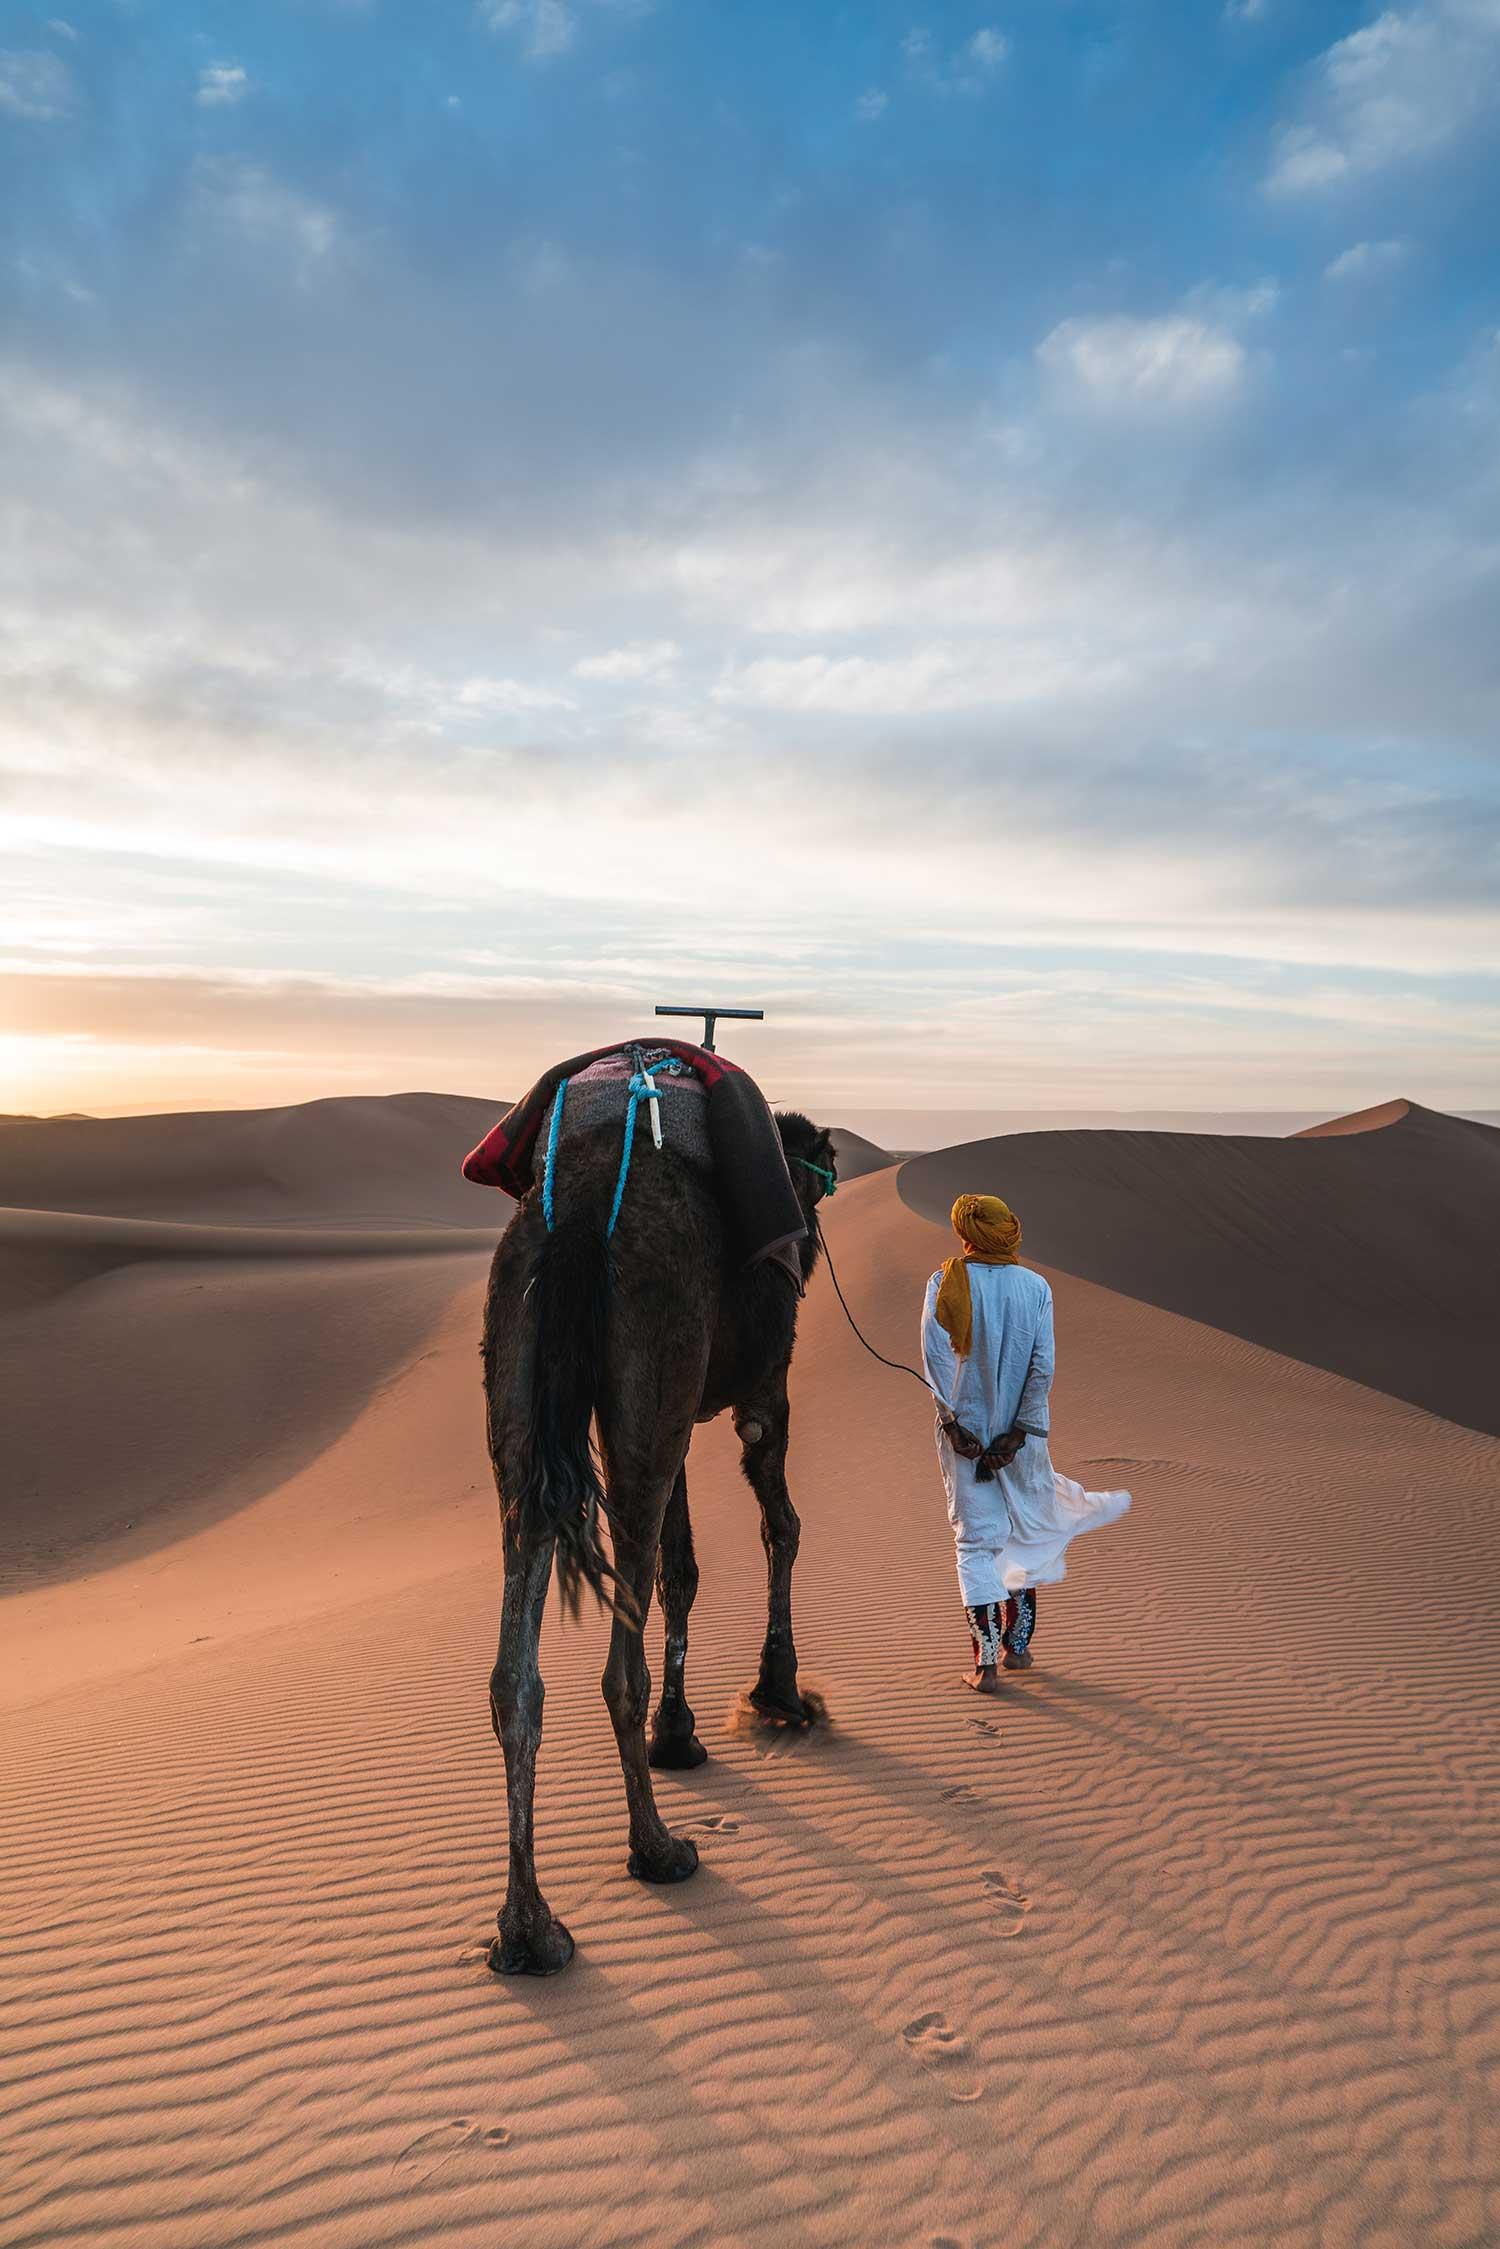 Morocco-desert-camel-walk-unsplash.jpg